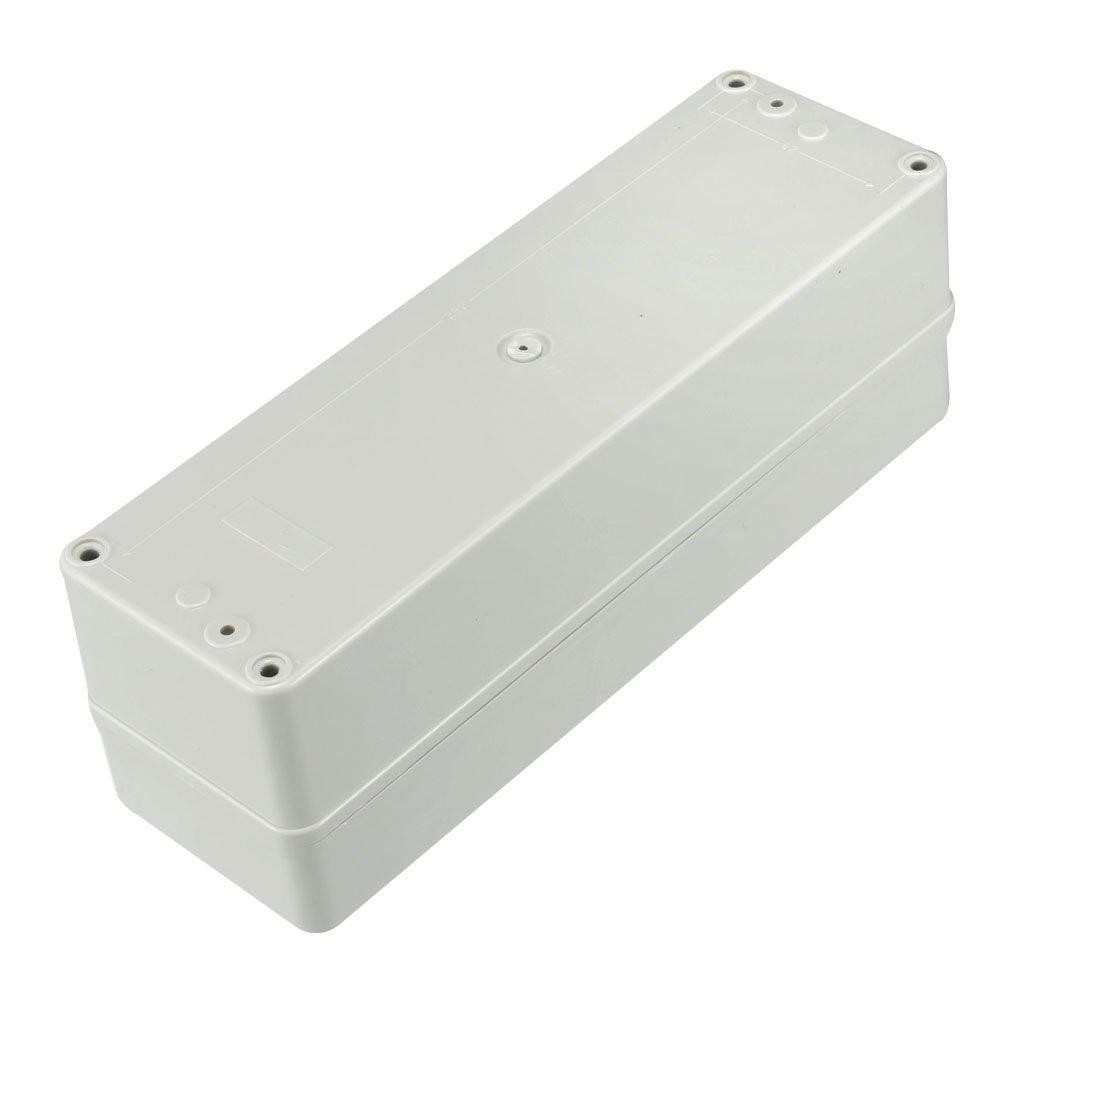 sourcingmap 83 x 81 x 56mm Electronic Plastic DIY Junction Box Enclosure Case Gray